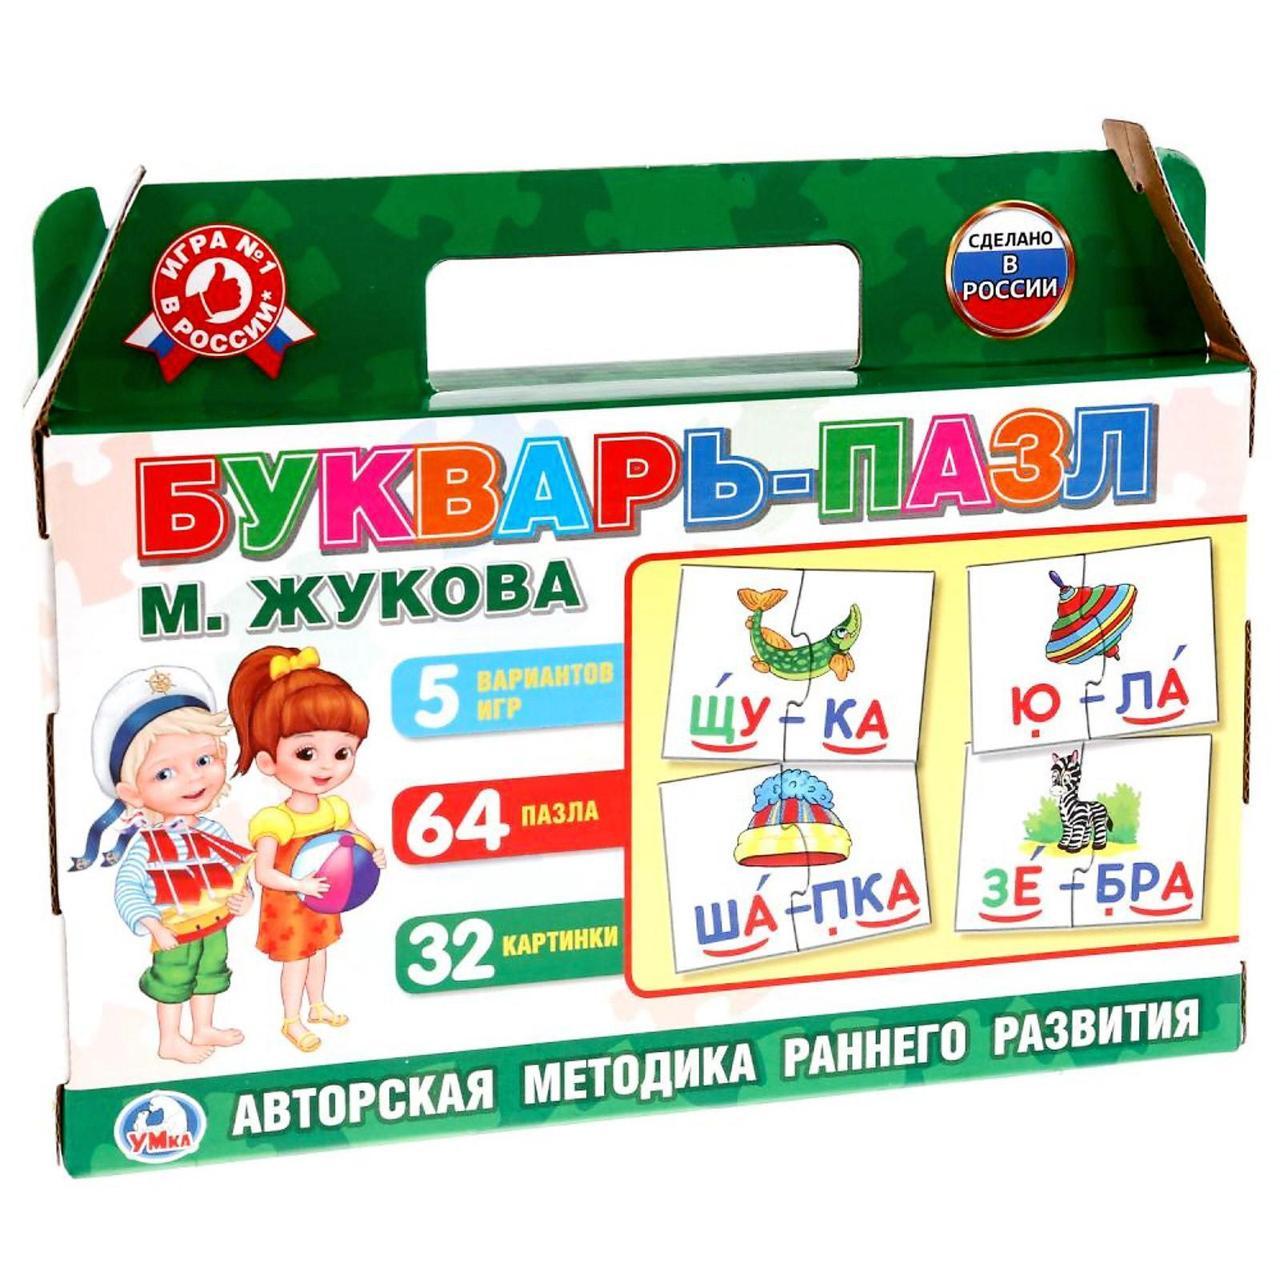 Букварь-пазл «5 игр М. Жукова», в коробке-чемодан